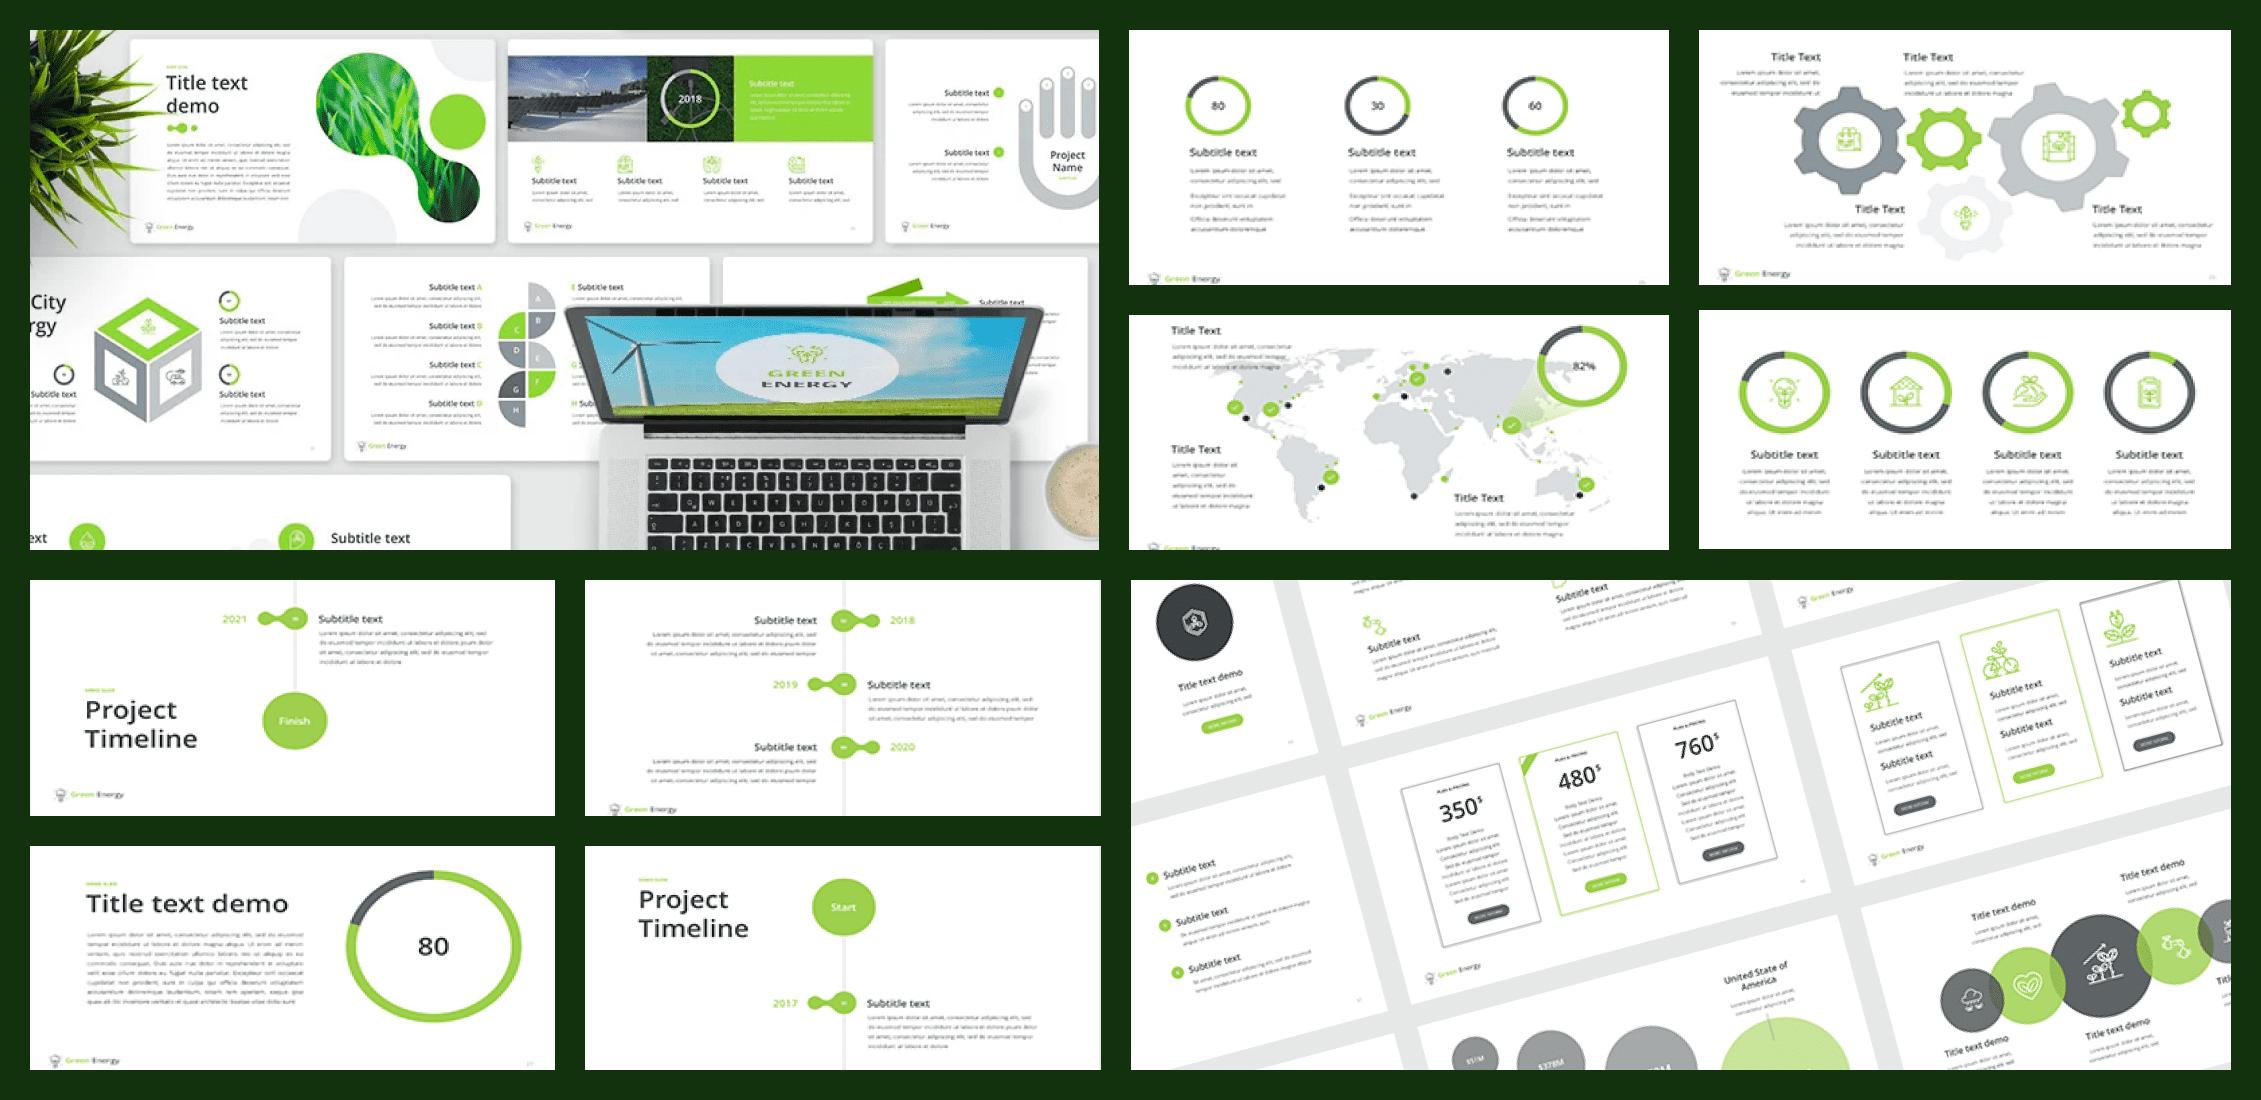 50+ Free and Premium Simple Google Slides Themes in 2021 - simple google slides theme 24